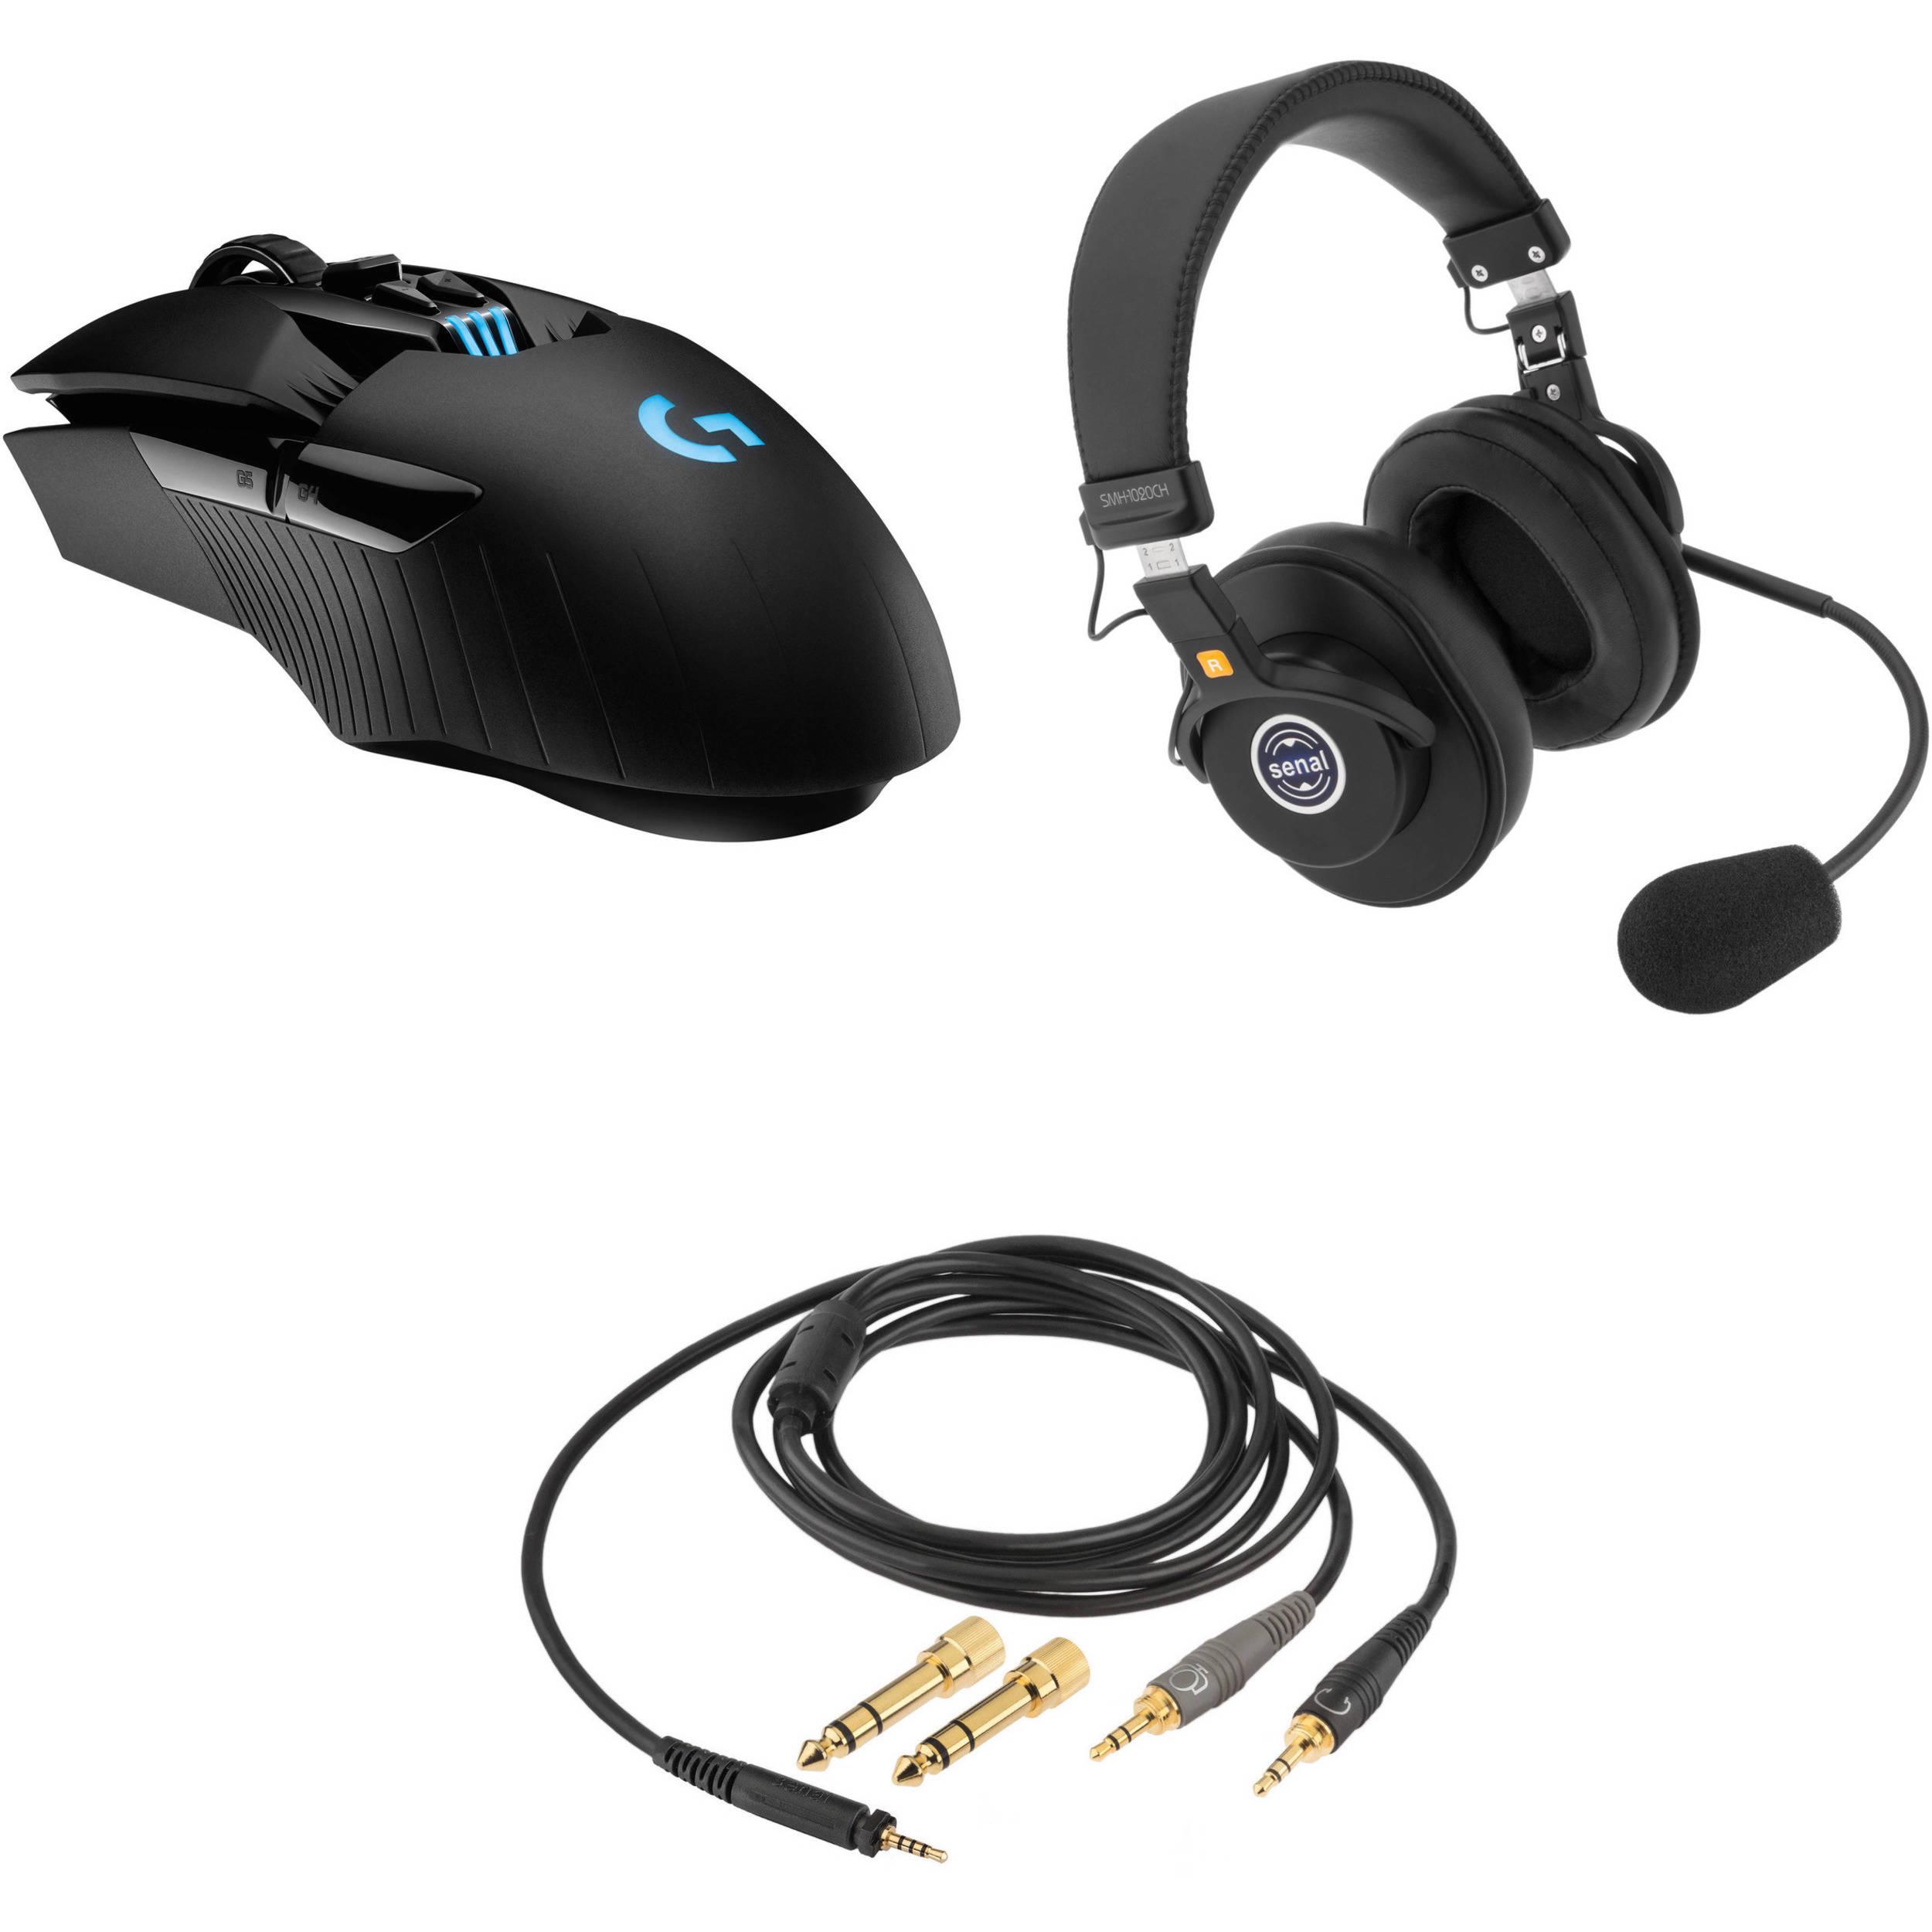 logitech wireless headset drivers windows 10